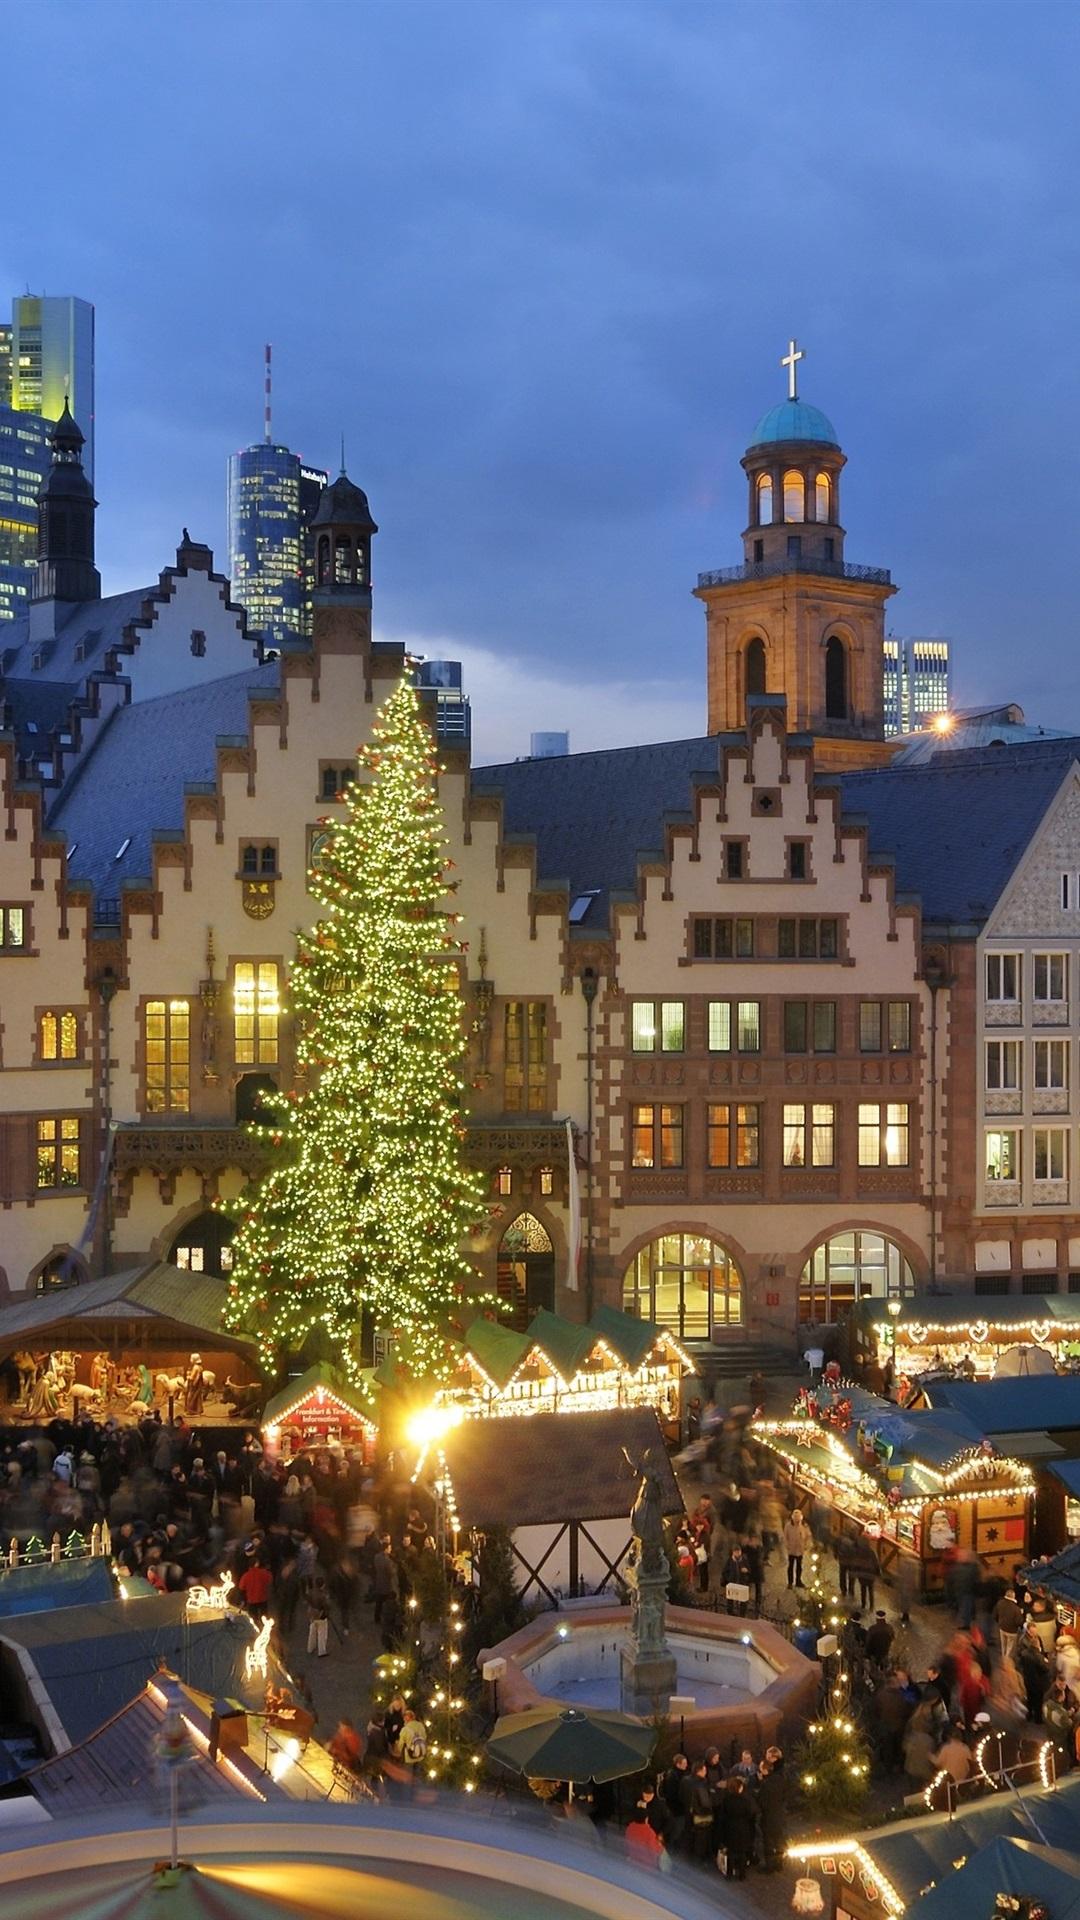 Christmas In Europe Wallpaper.Wallpaper Christmas Houses Night Lights People Market